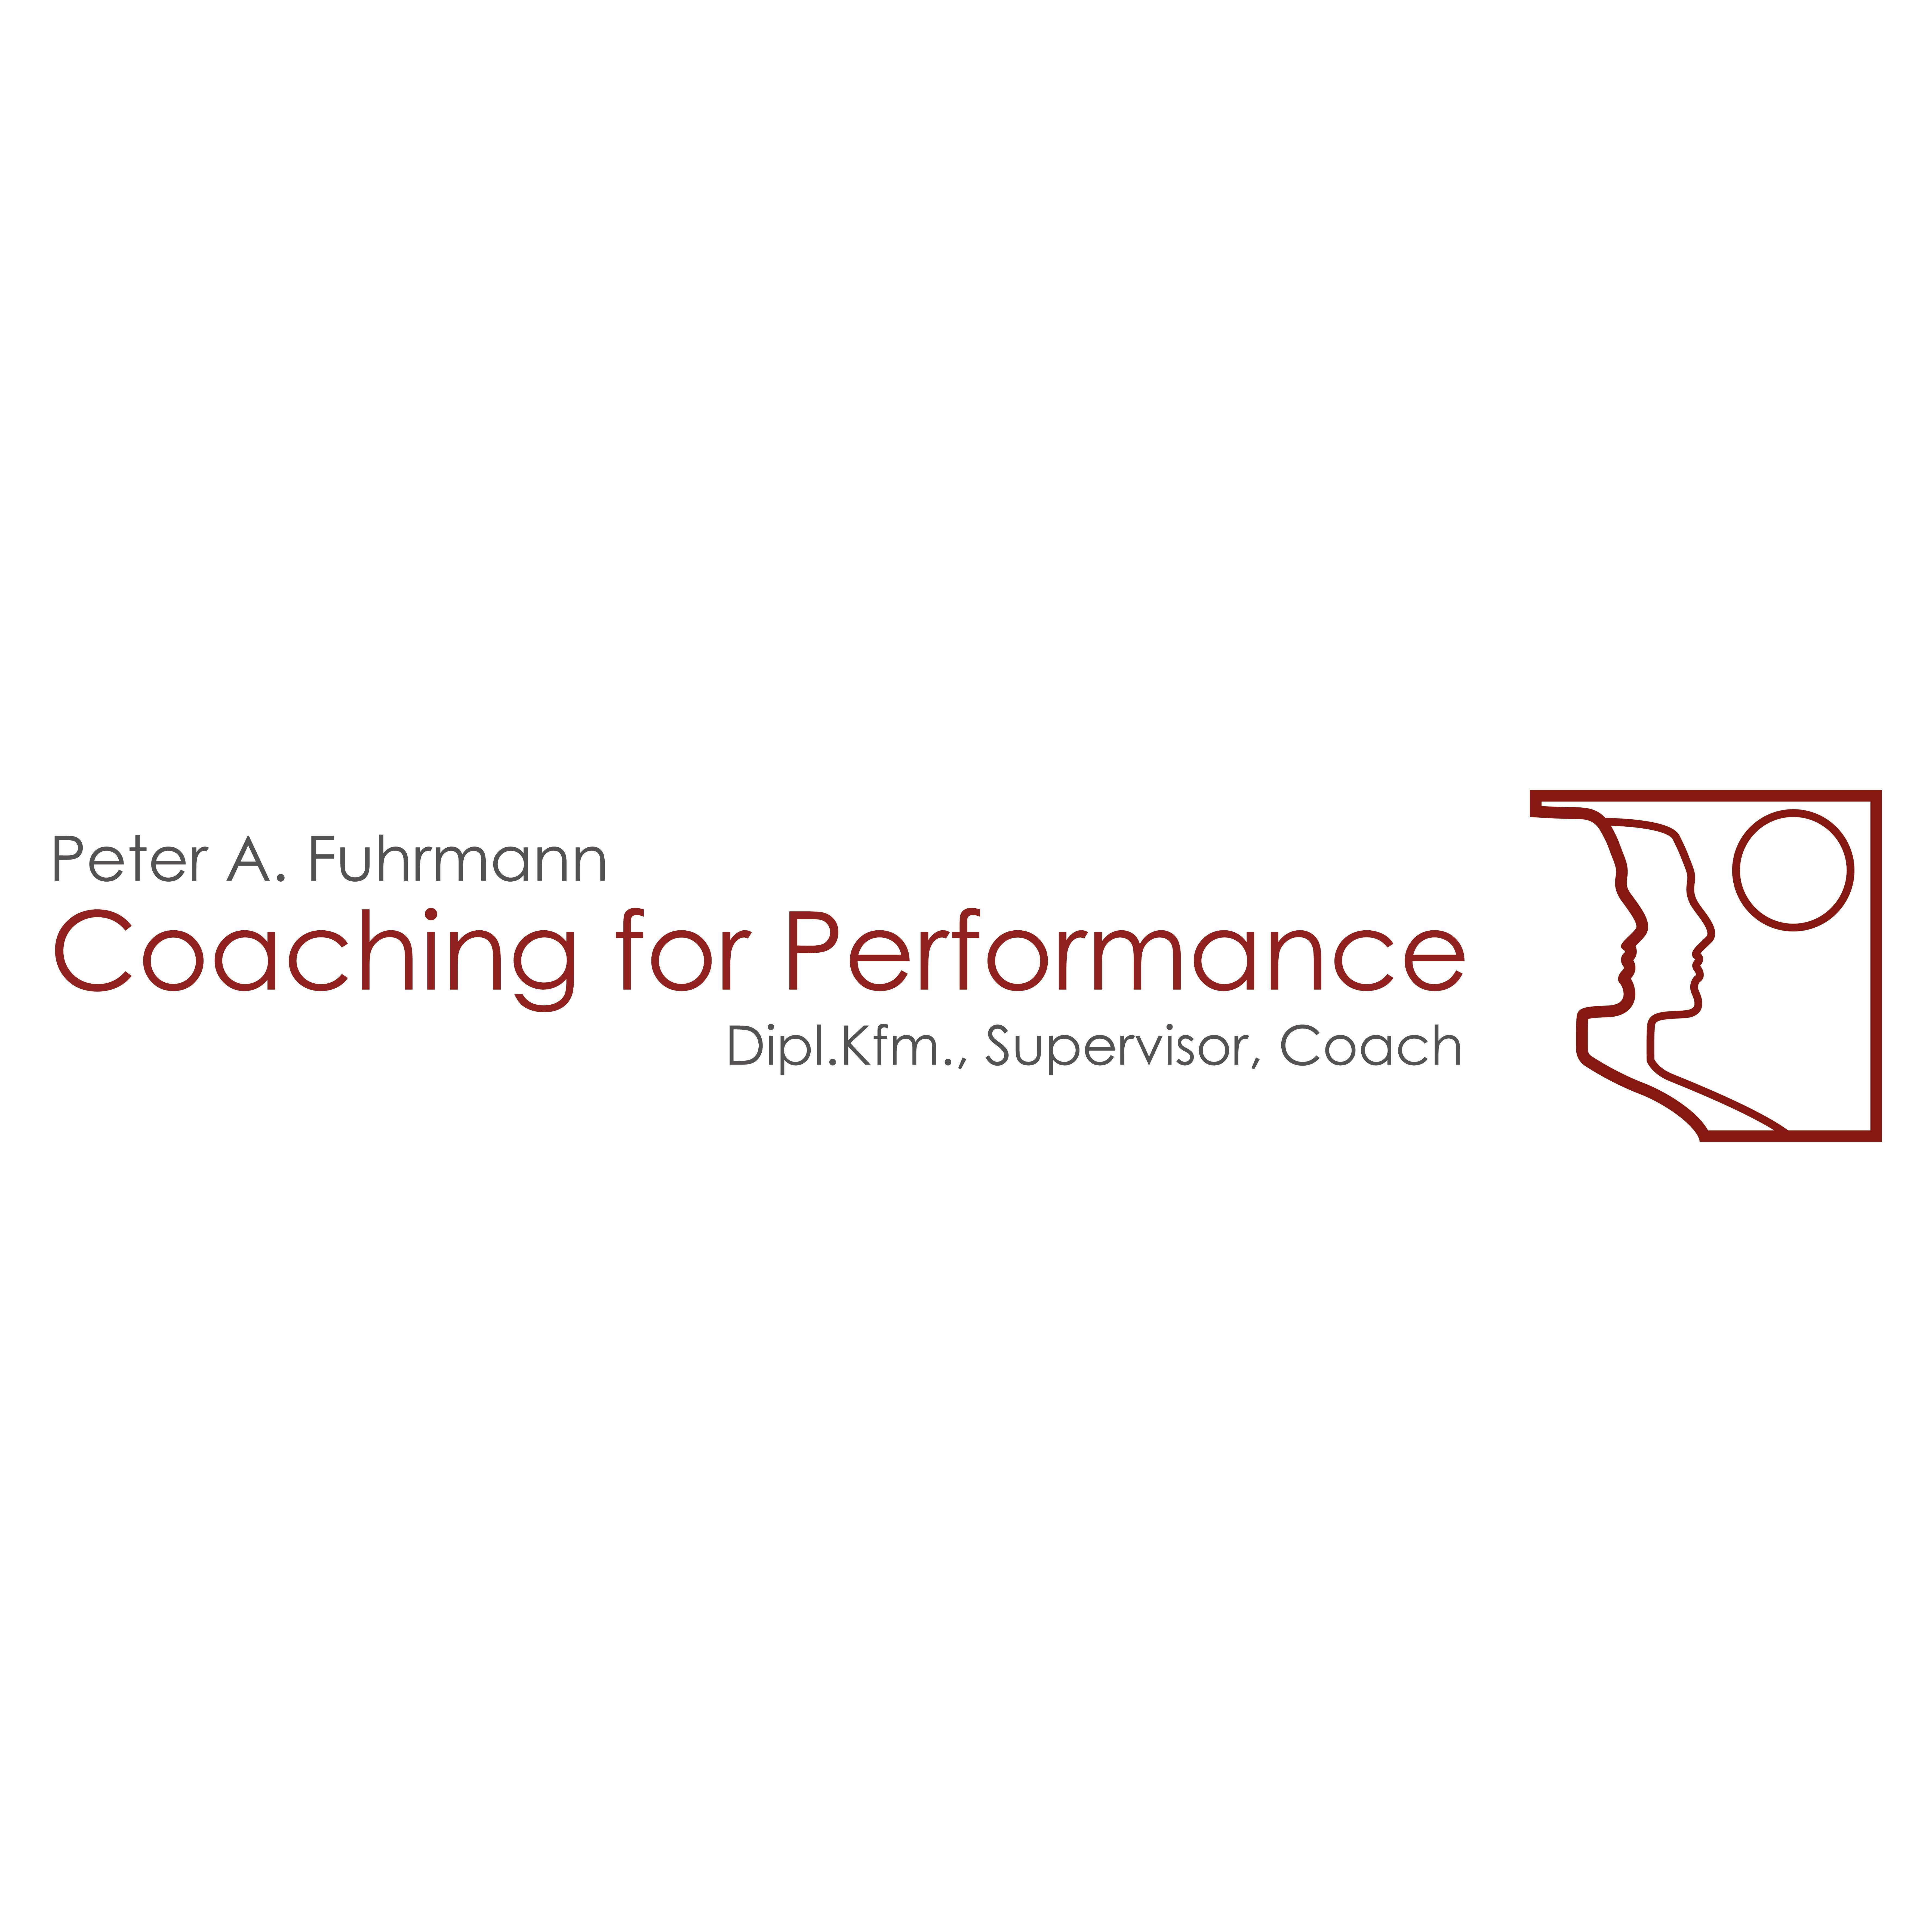 Bild zu Coaching for Performance. Dipl. Kfm. Peter A. Fuhrmann in Düsseldorf